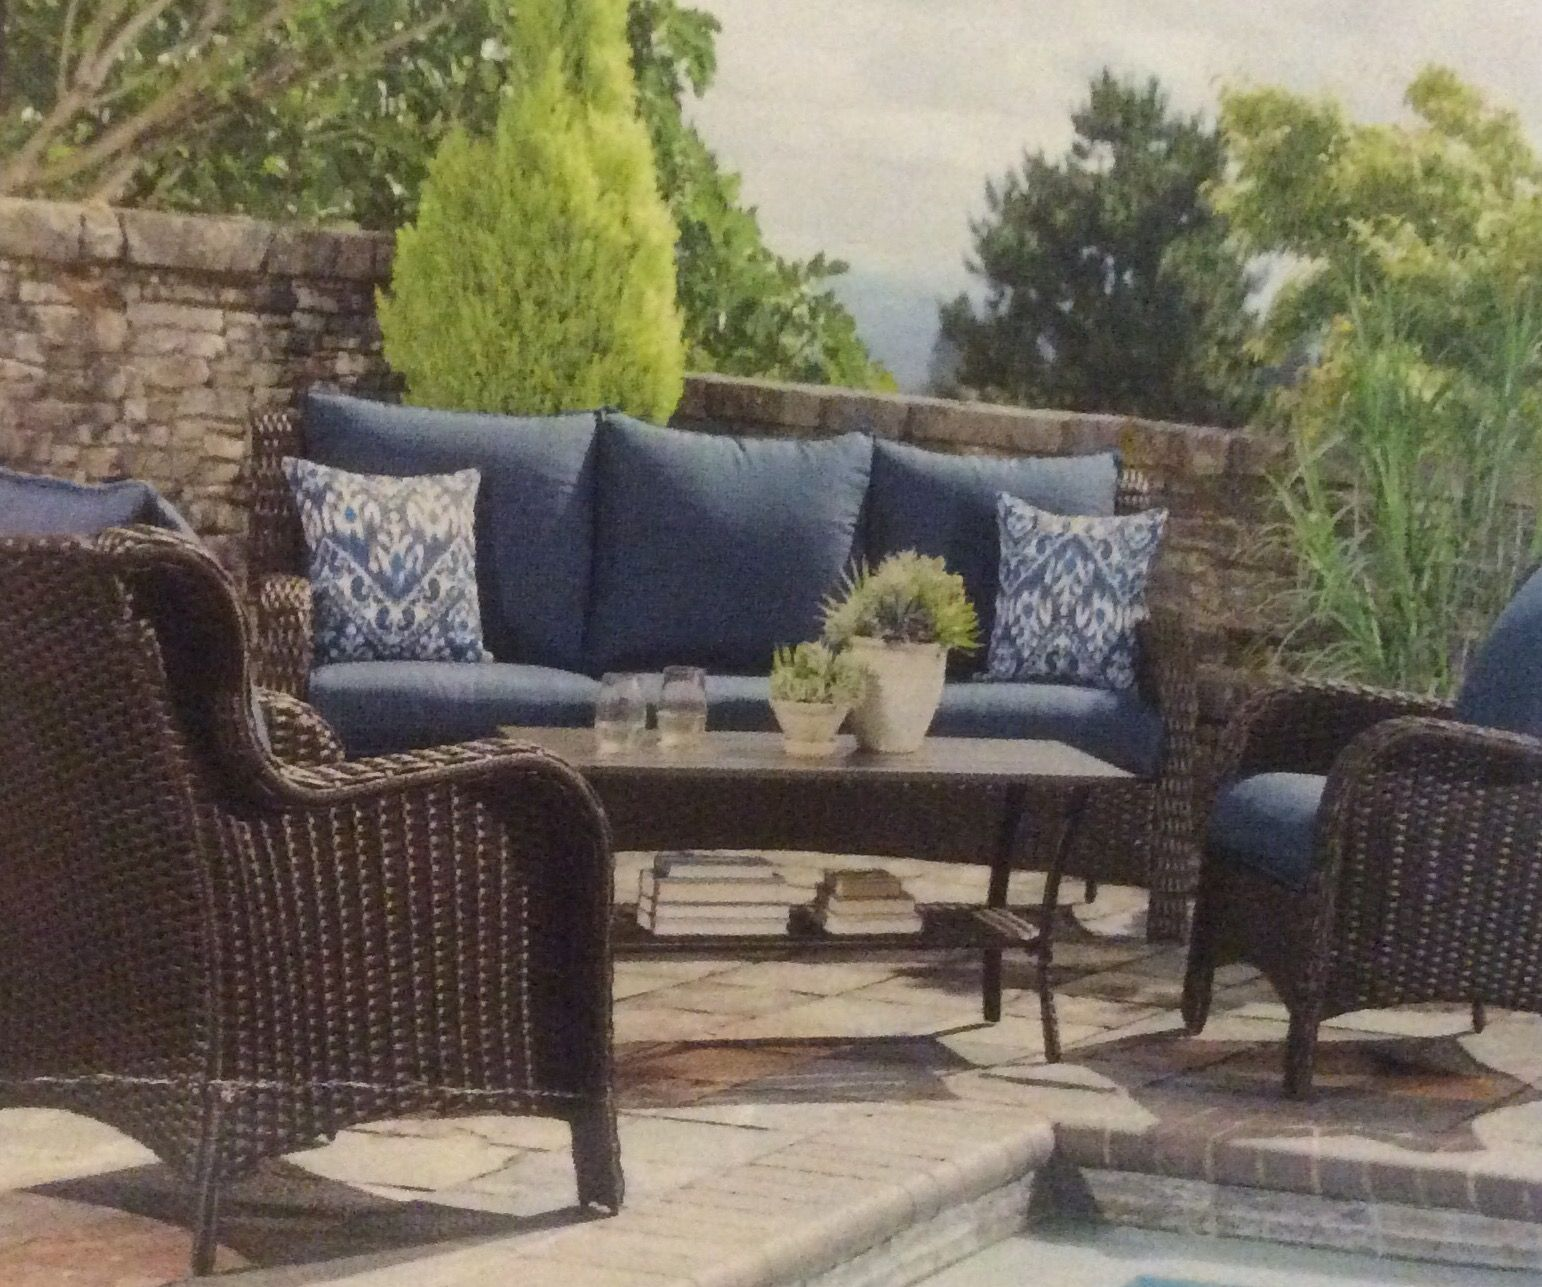 Palisades 4-piece wicker sofa set. Includes 2 wicker ...